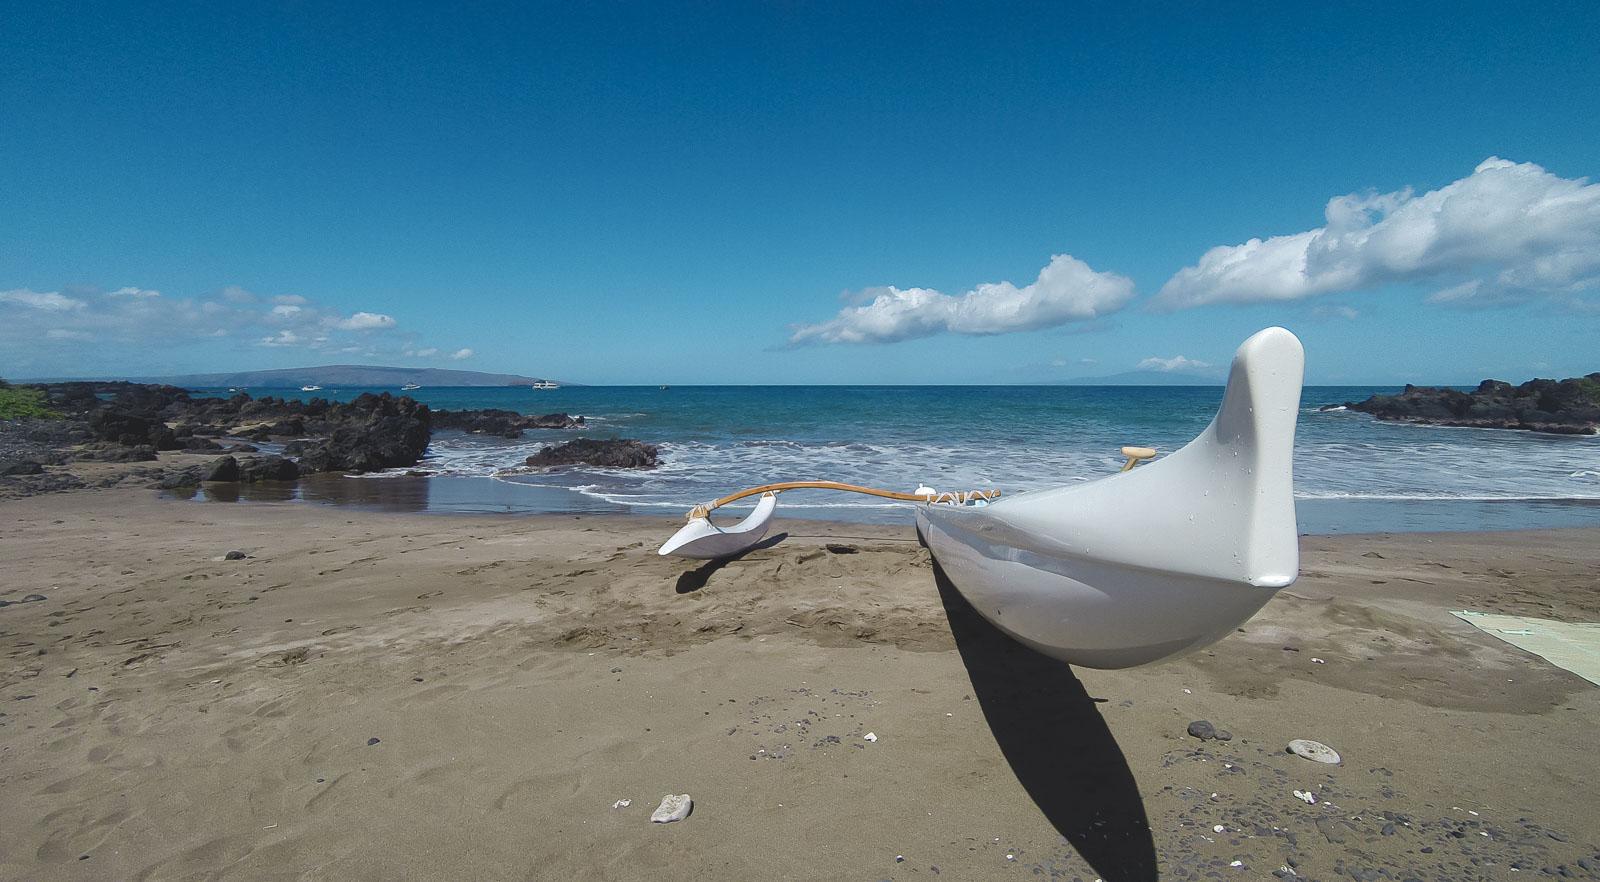 Outrigger Canoe onBeach in Maui